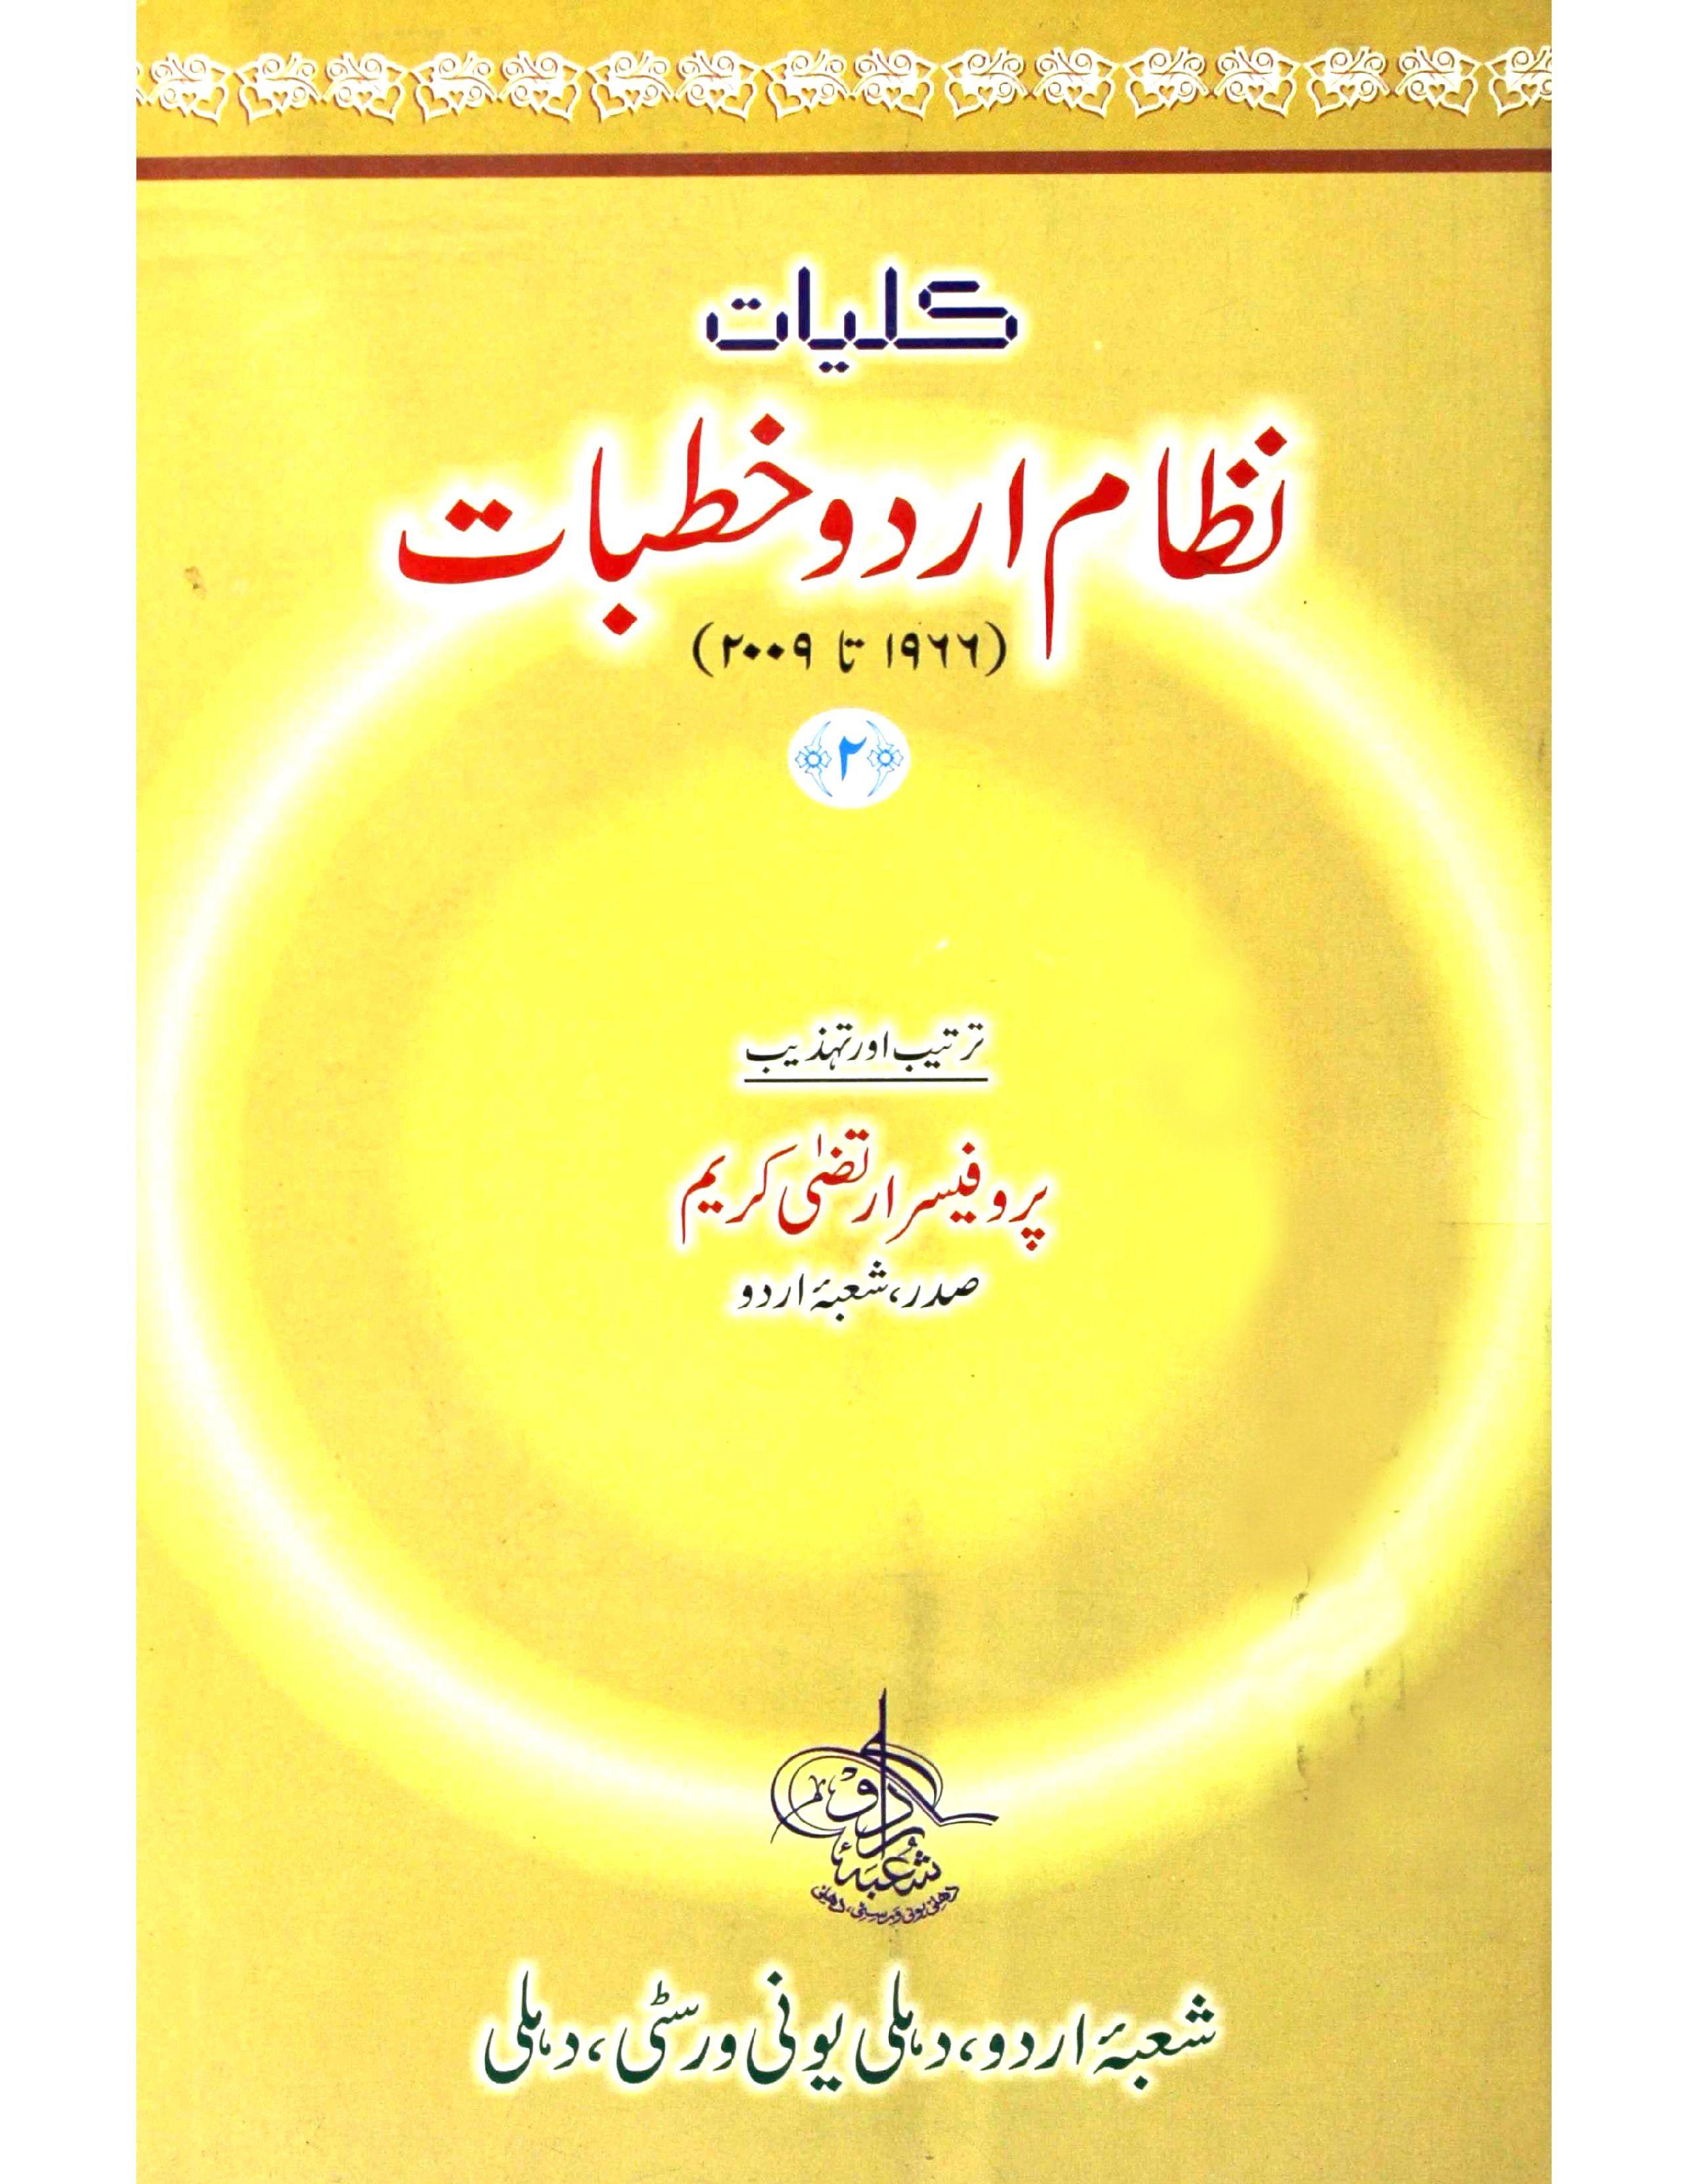 Kulliyat-e-Nizam-e-urdu Khutbat     Volume-002